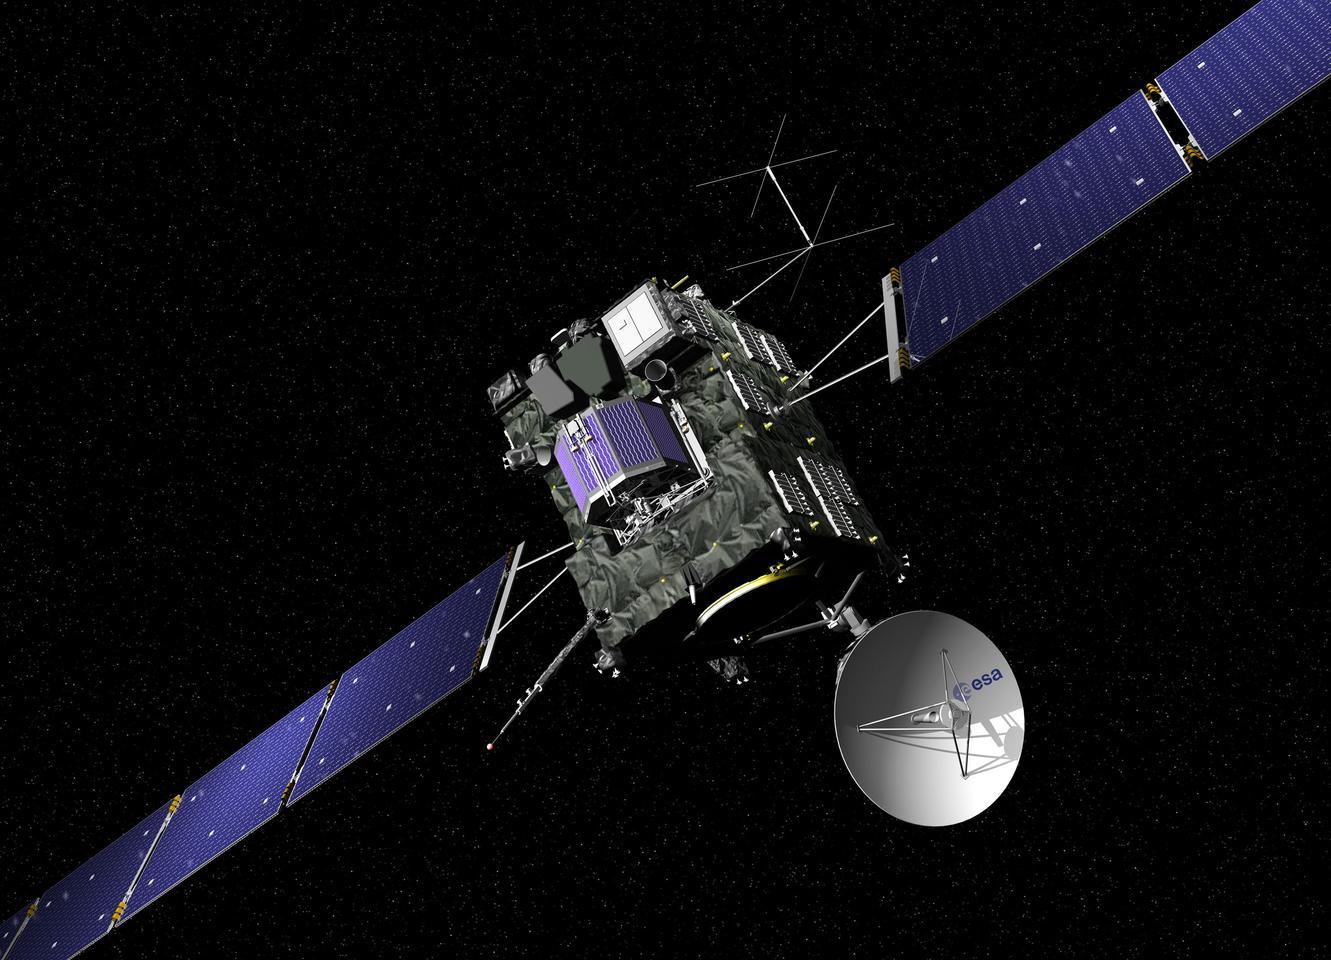 Artist's impression of the Rosetta spacecraft (Image: ESA - J. Huart)